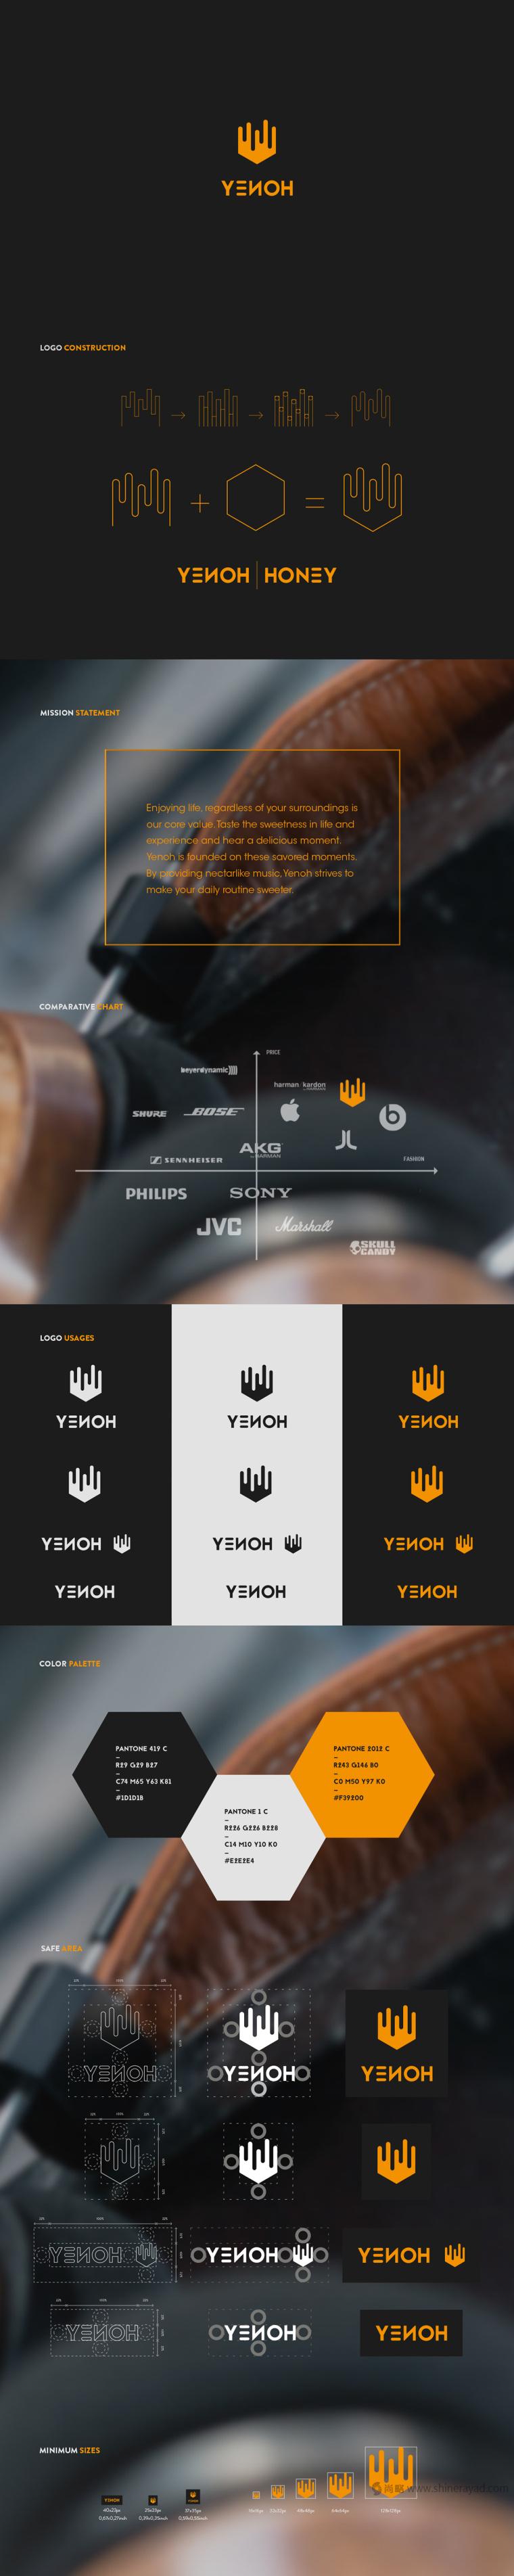 YENOH 耳机品牌LOGO设计概念与品牌定位-上海LOGO设计公司设计欣赏2